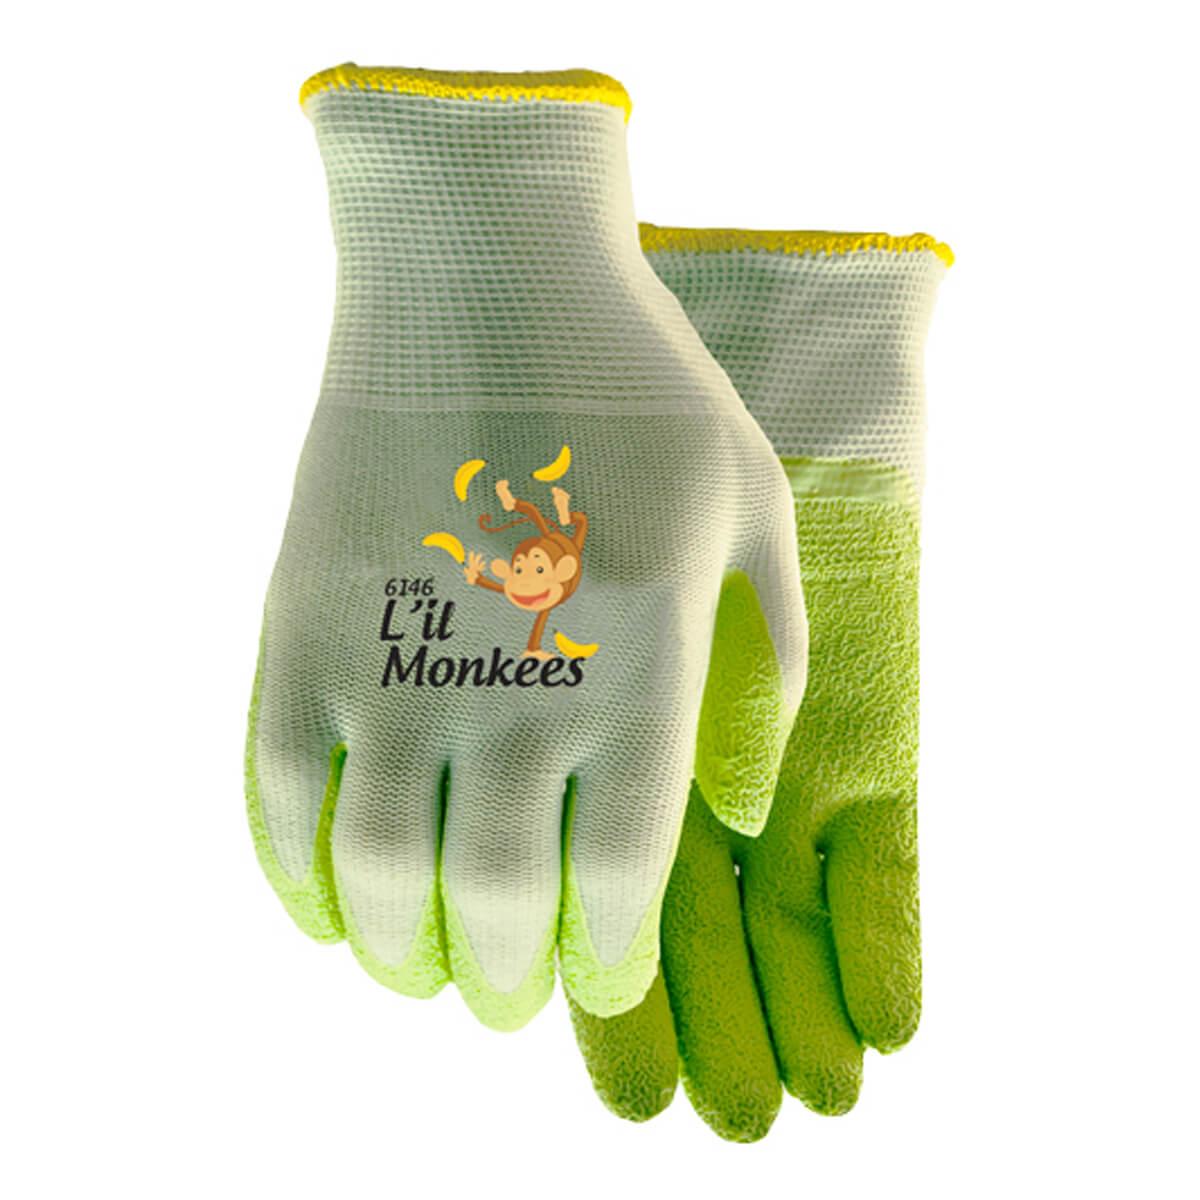 L'Il Monkees Gloves - XS